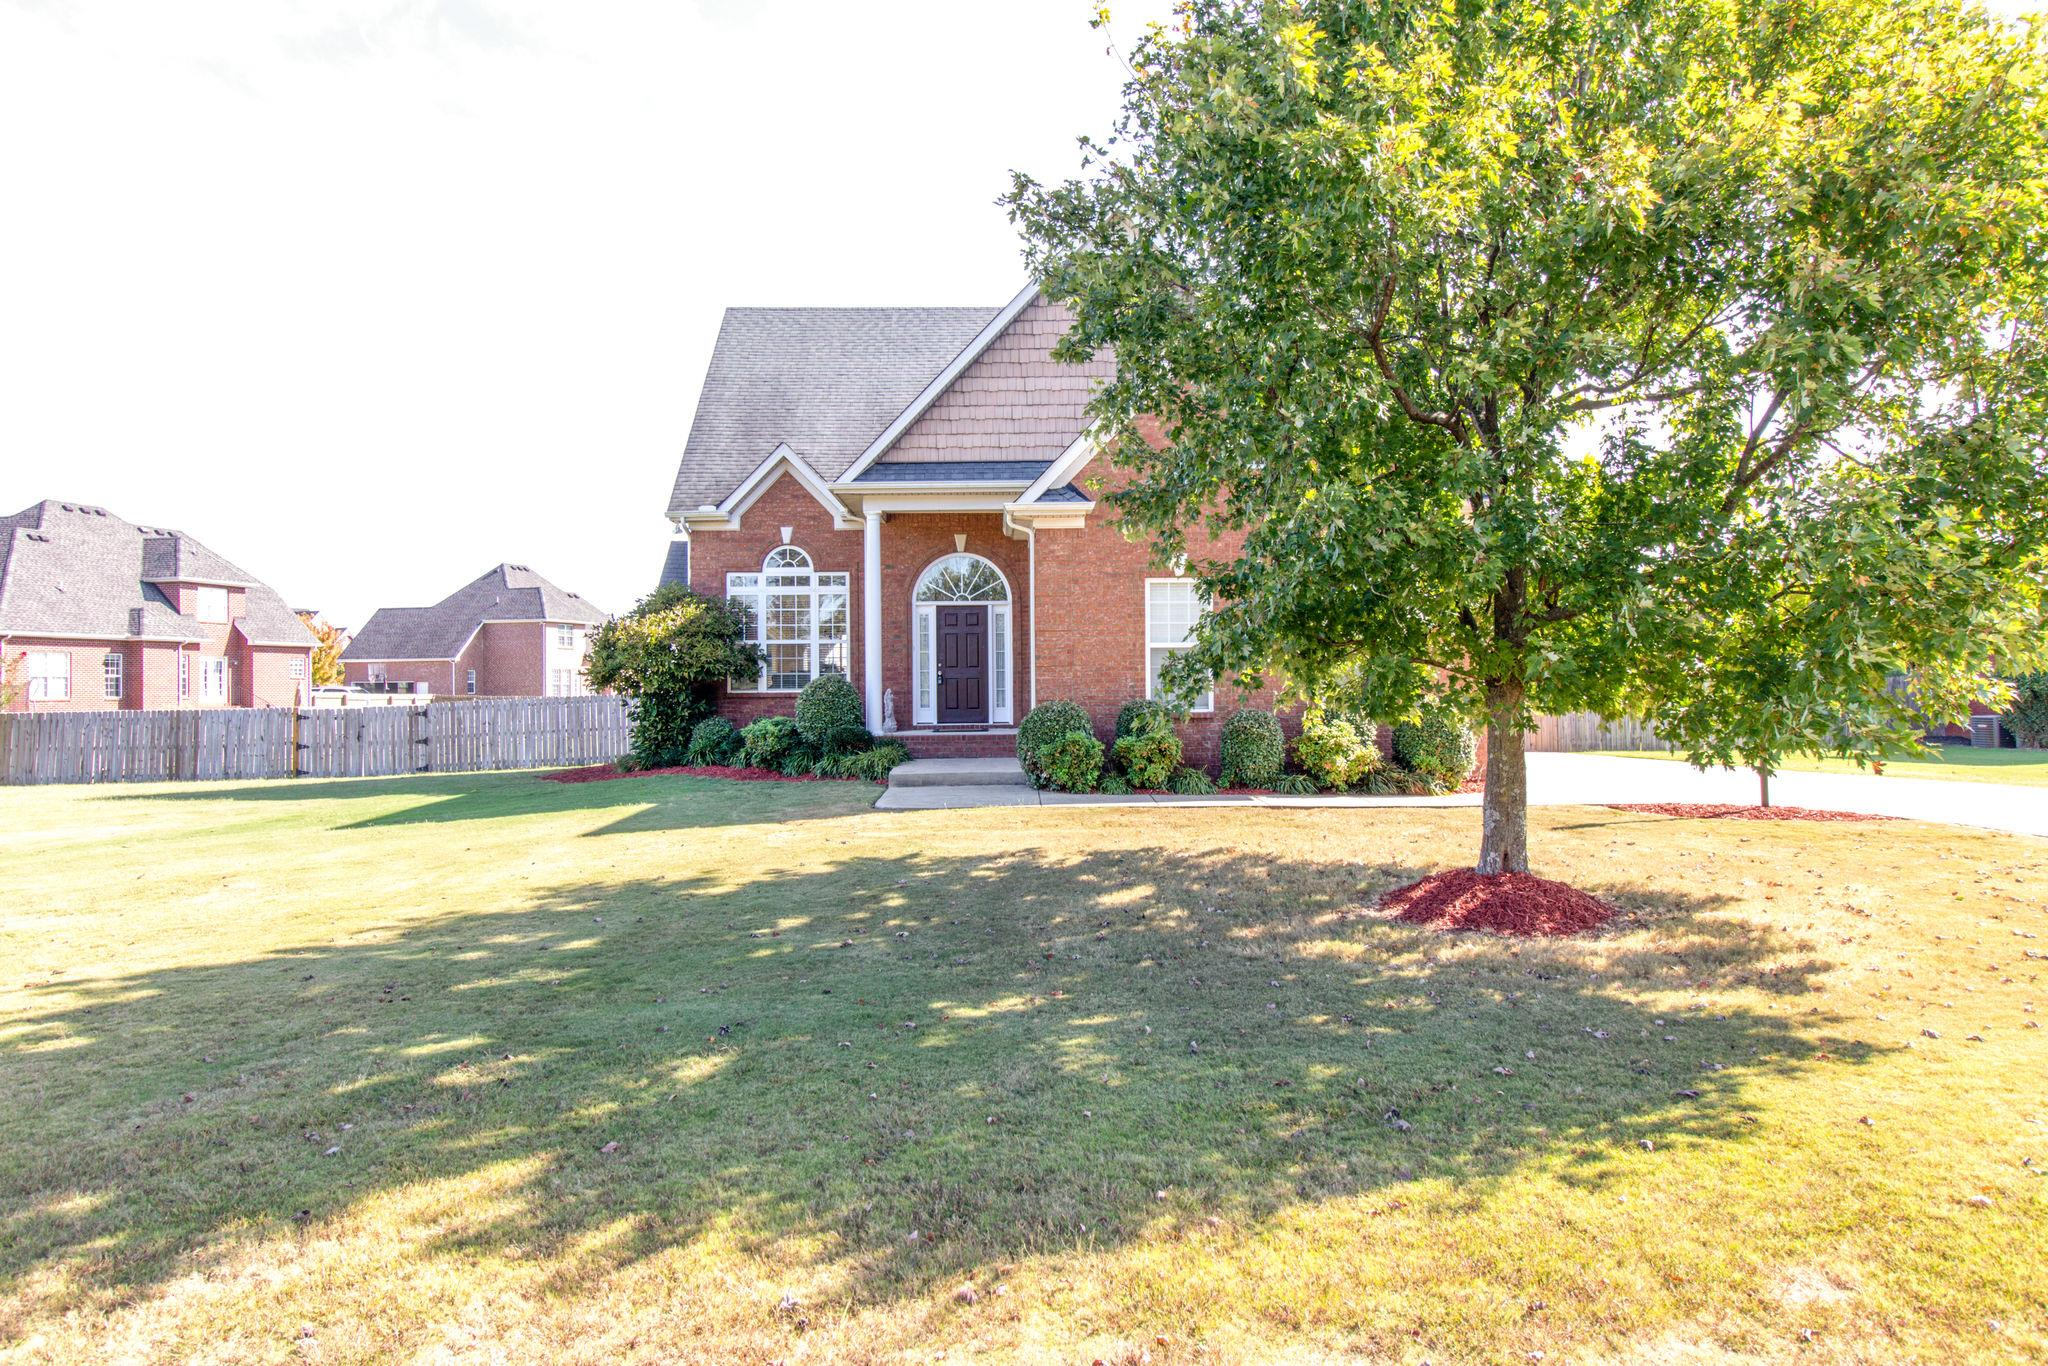 2132 Salem Woods Dr, Rockvale, TN 37153 - Rockvale, TN real estate listing